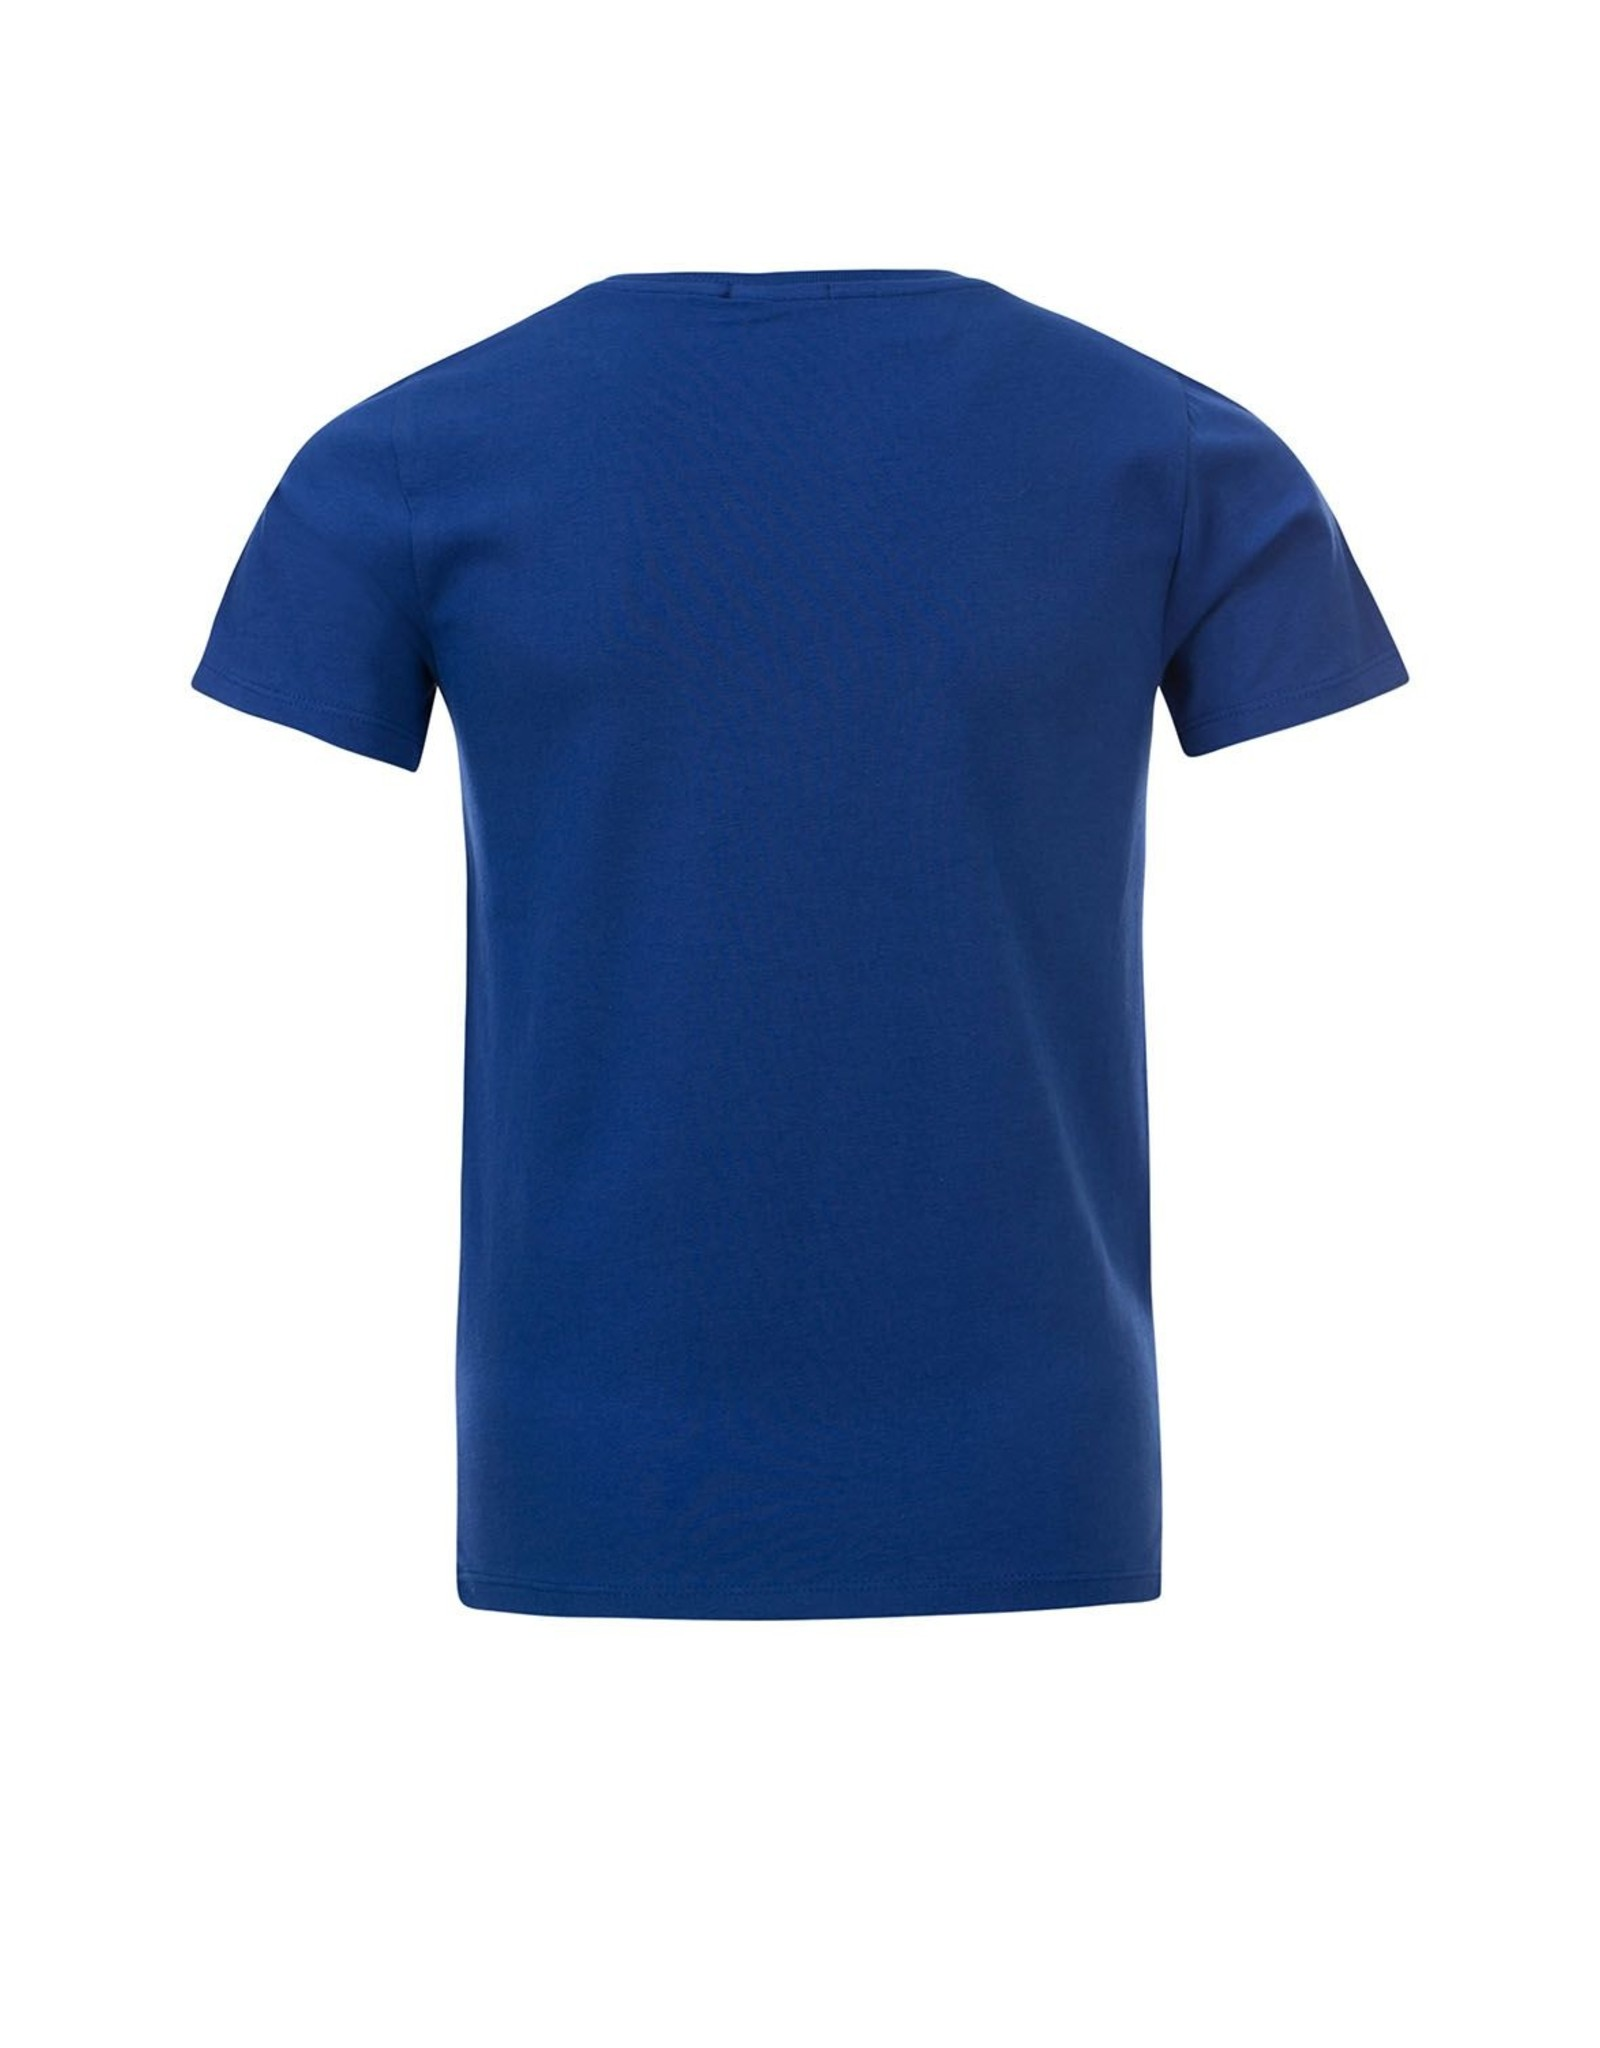 Common Heroes TOBIAS T-shirt1